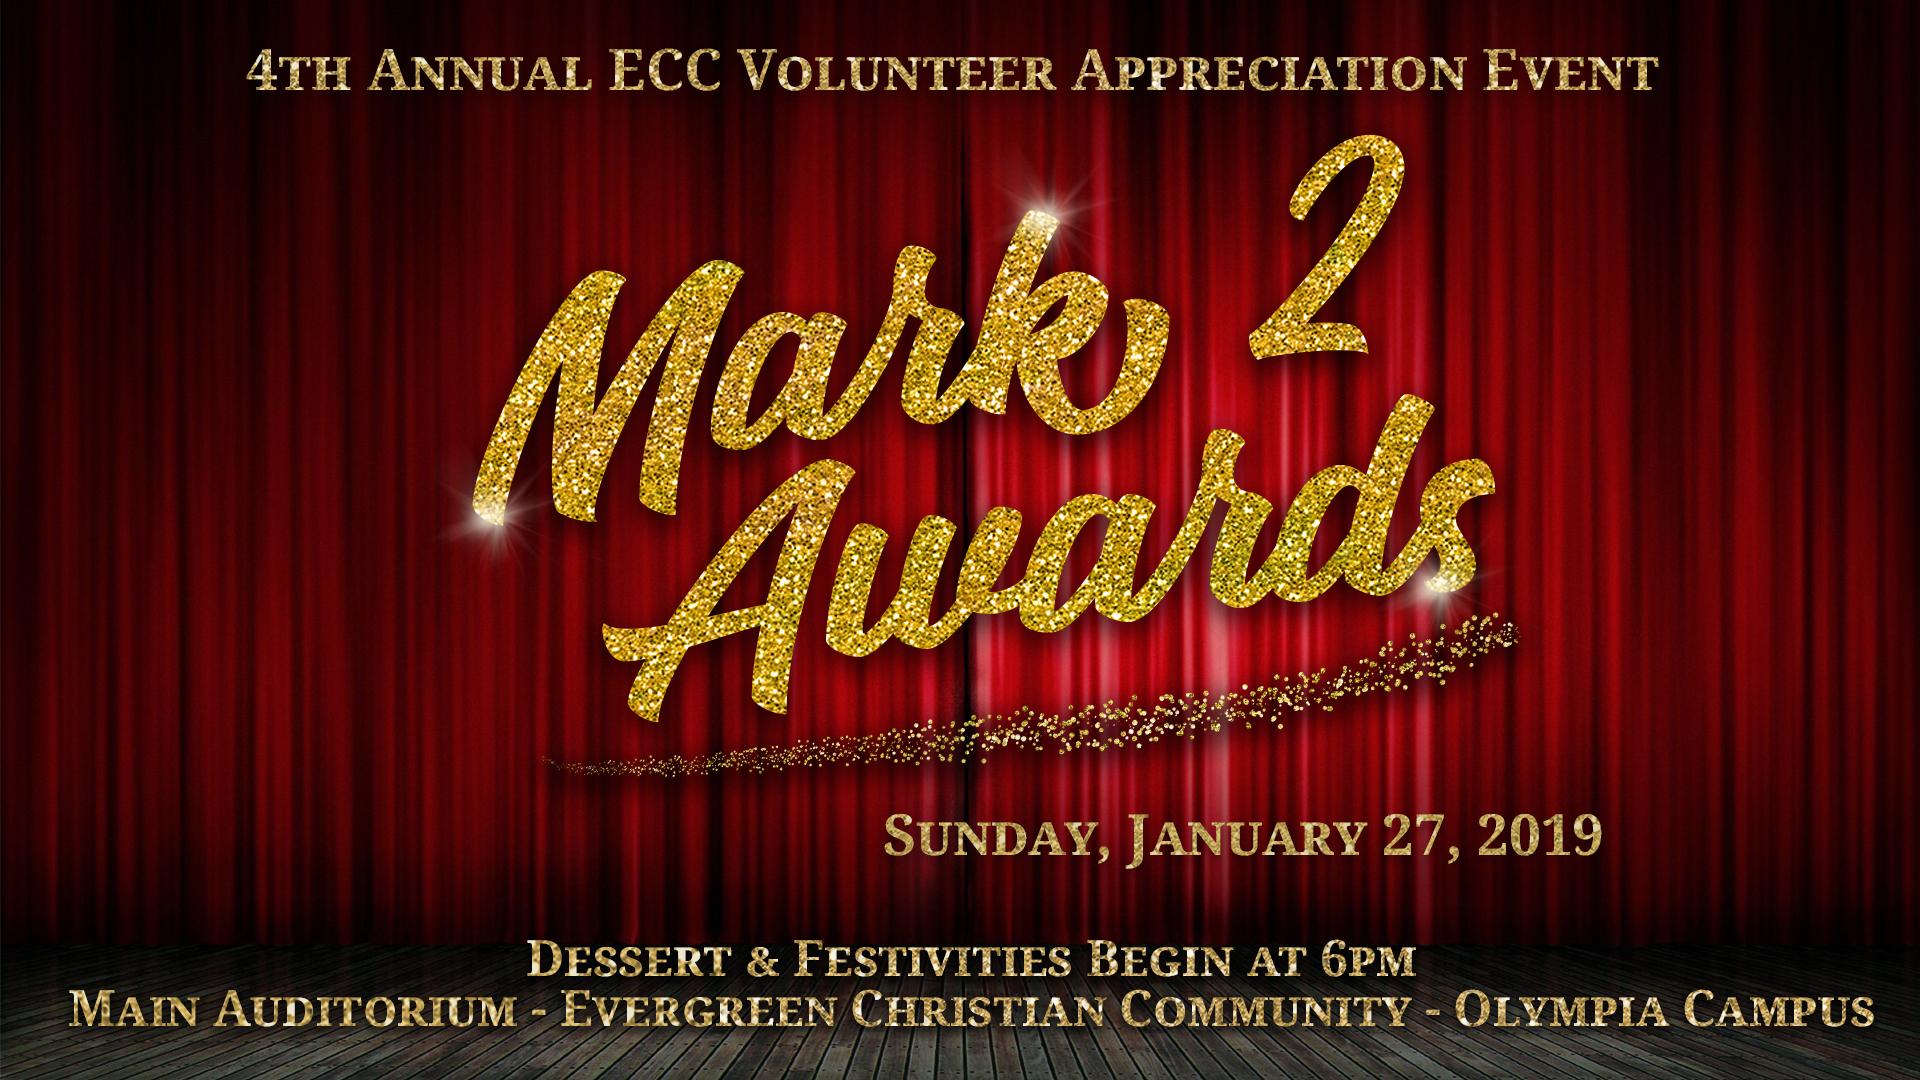 Mark 2 Awards 2019 Announcement Slide other campuses.jpg